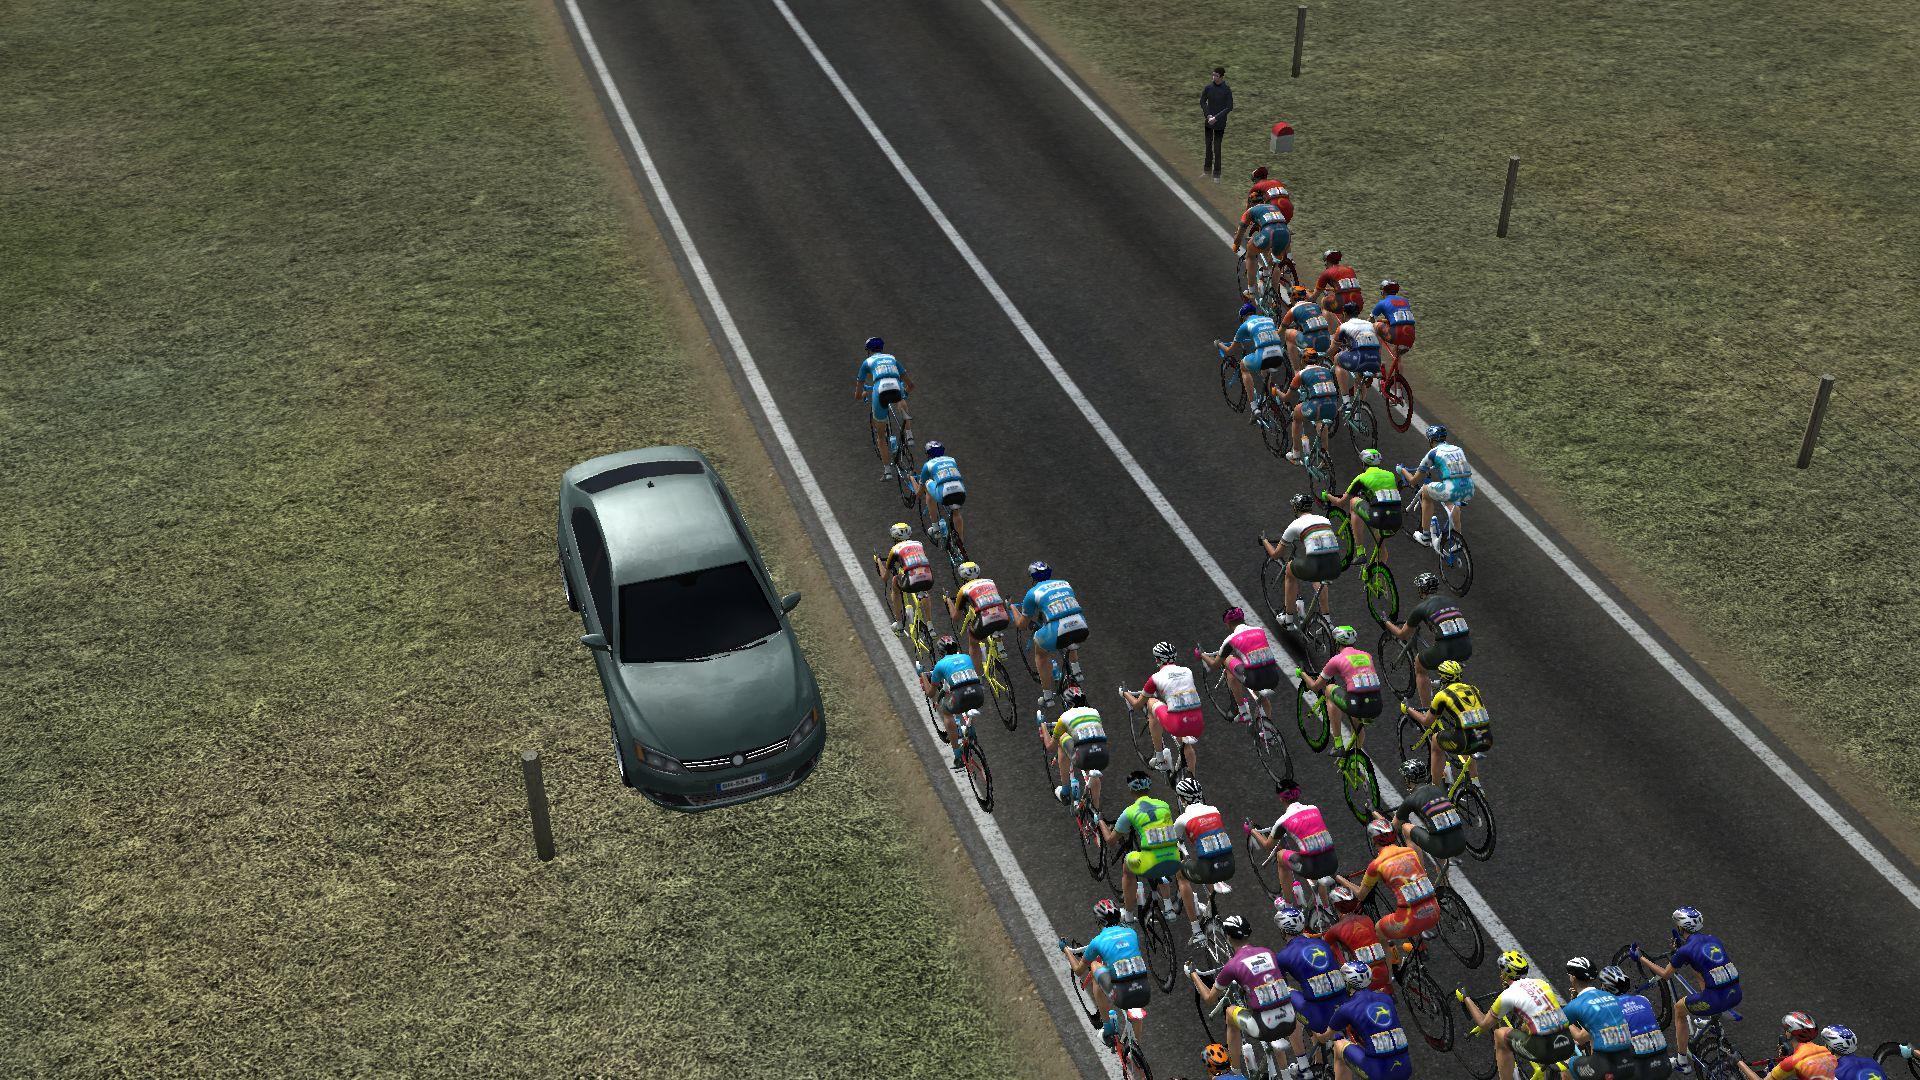 pcmdaily.com/images/mg/2019/Races/GTM/Giro/mg19_giro_18_PCM0265.jpg